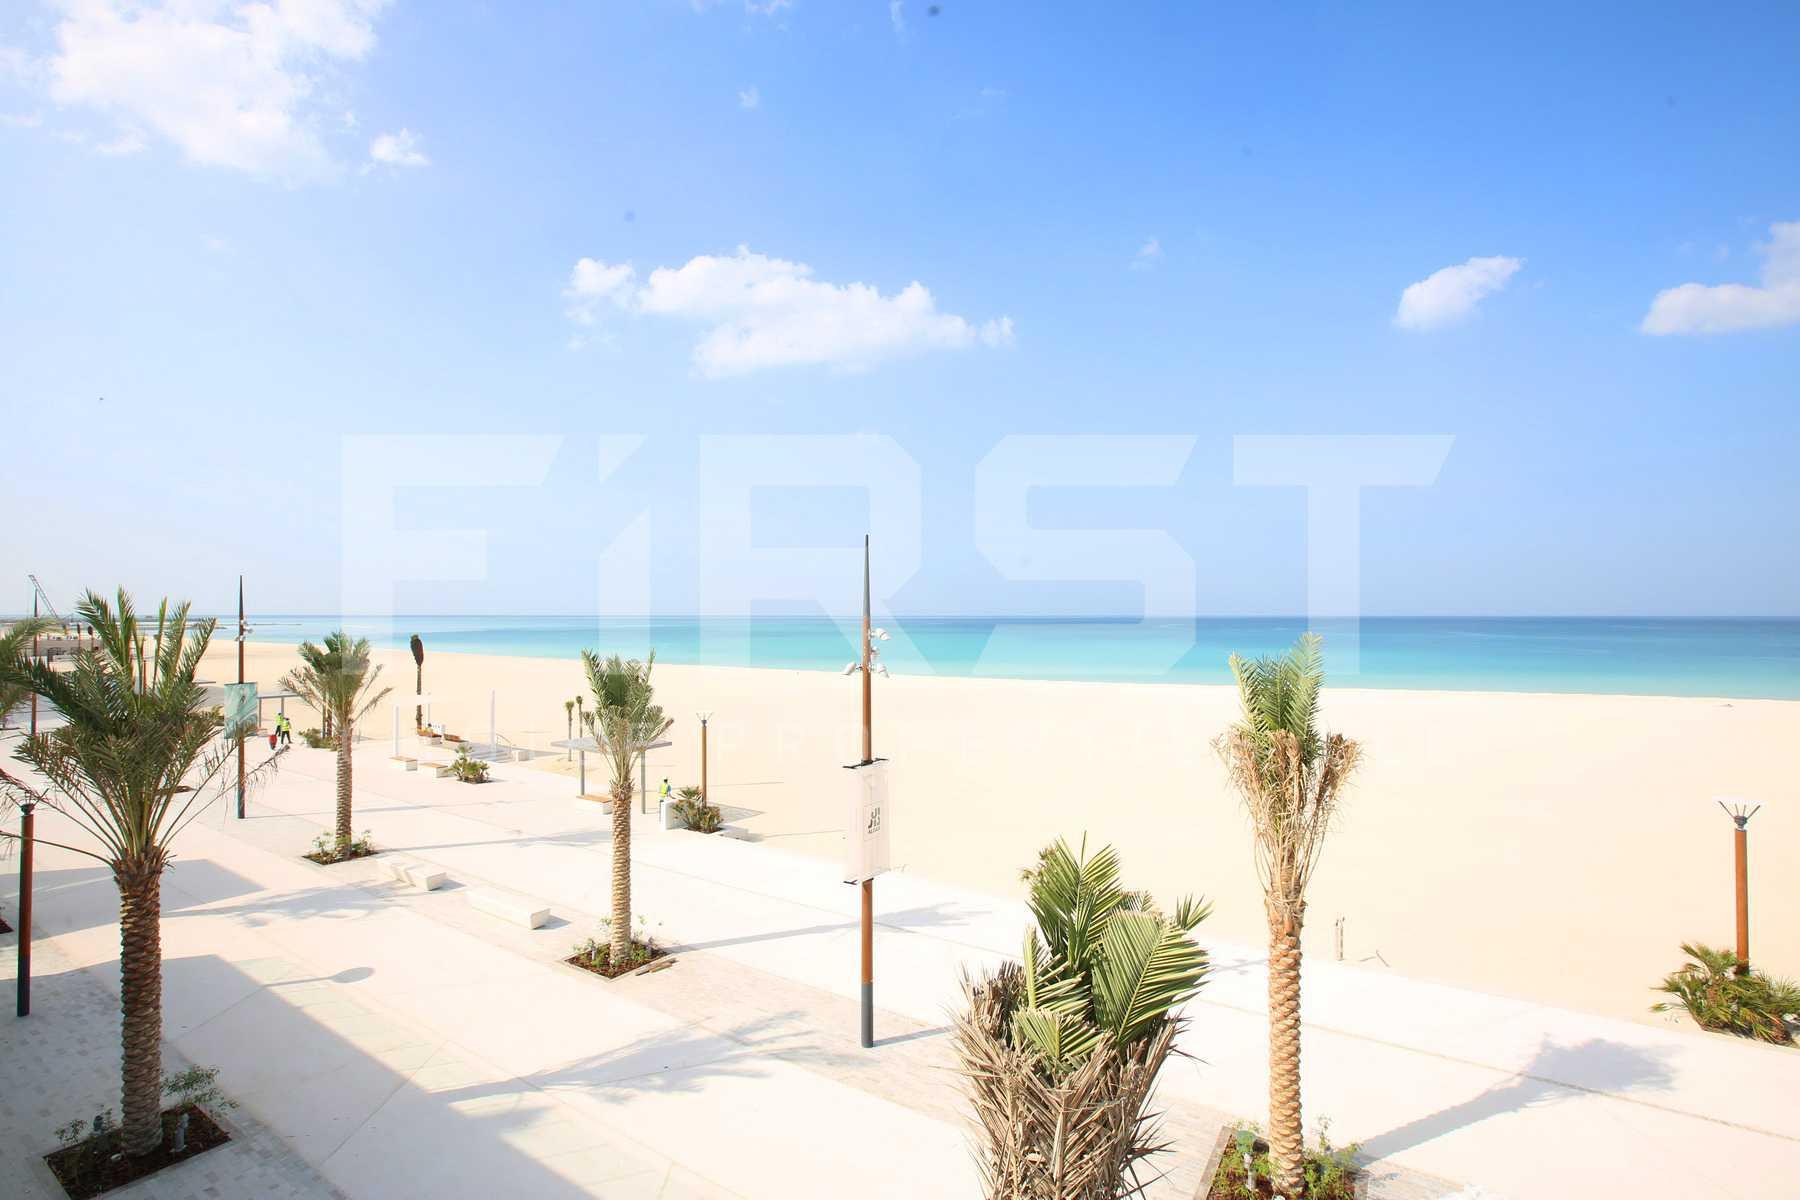 External Photo of Mamsha Al Saadiyat Island UAE (4).jpg